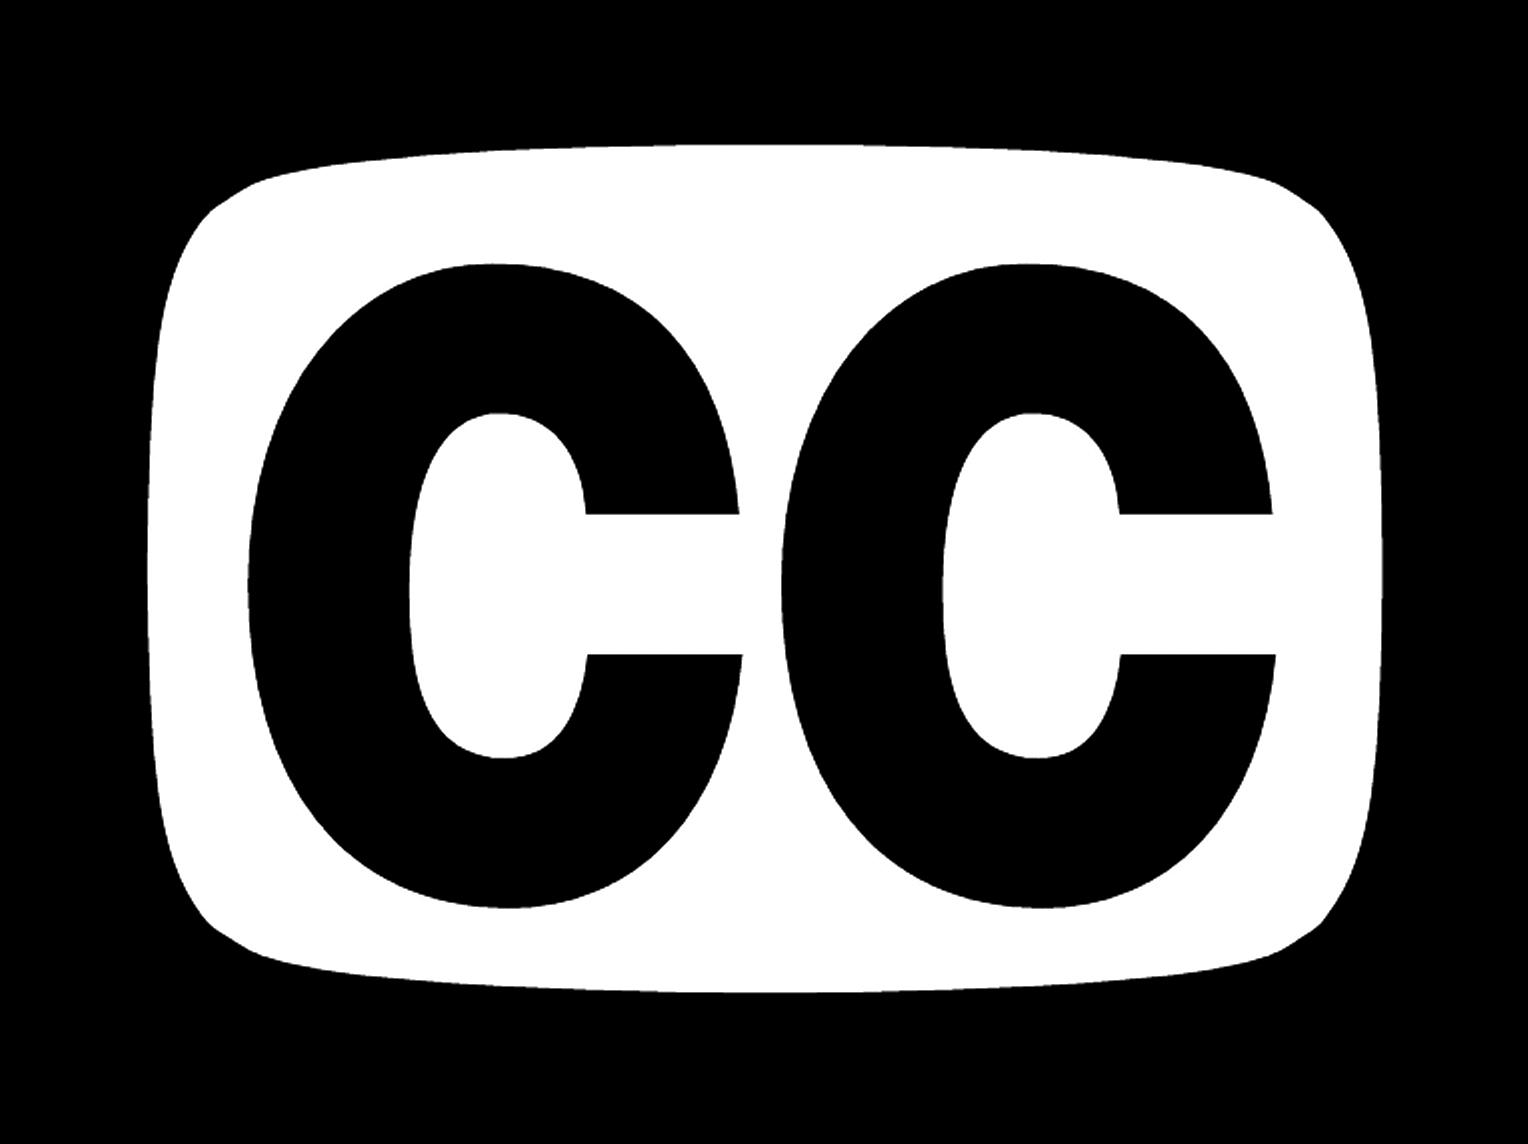 Closed Captioning Gary D Robson Electronic Circuit Crossing Symbol Clip Art At Clkercom Vector Cc Logo